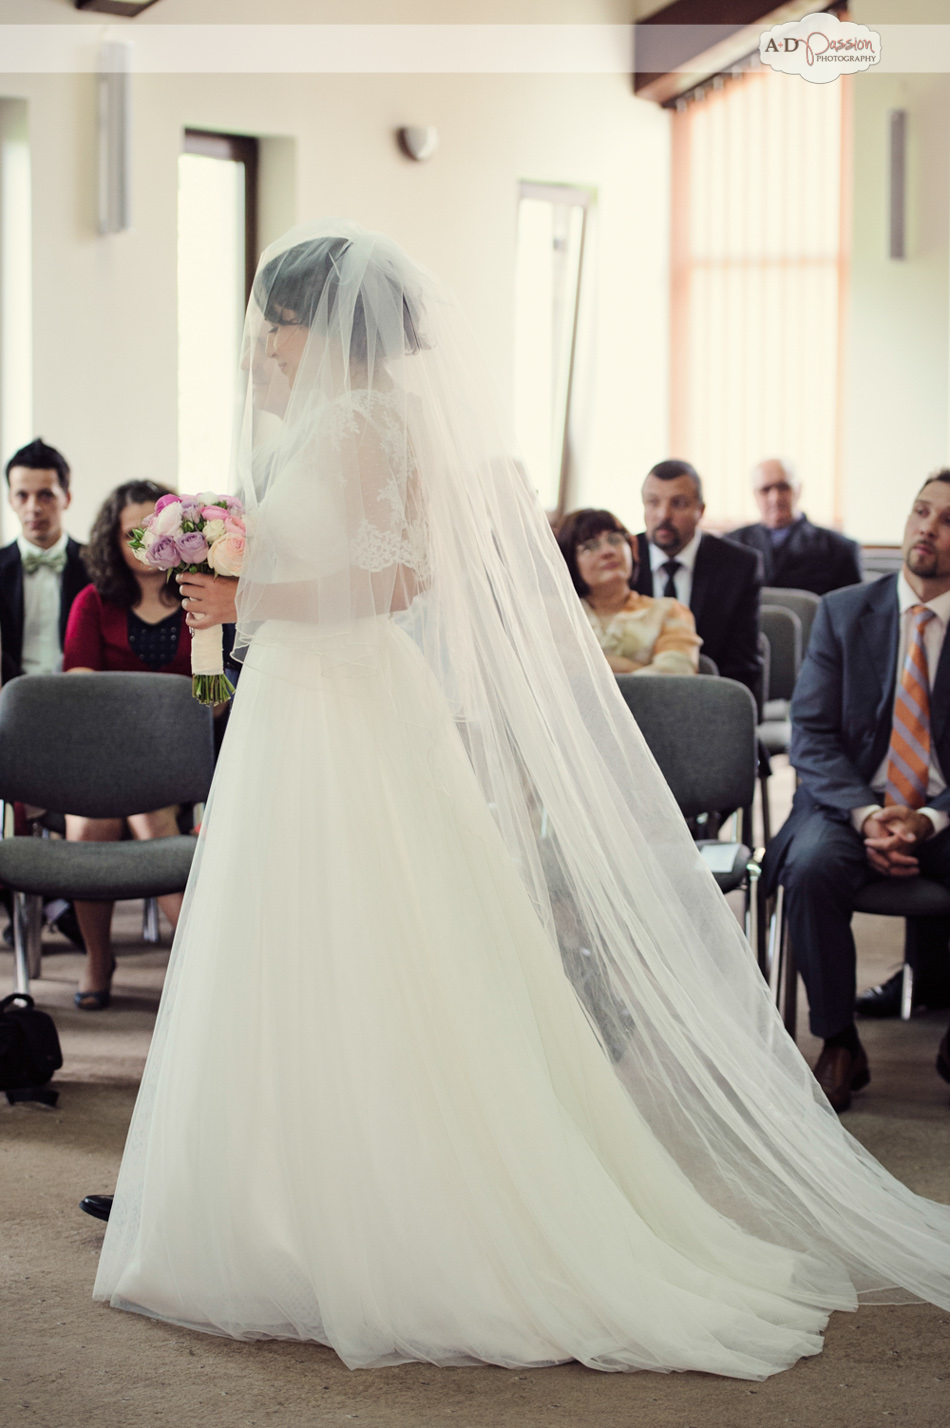 AD Passion Photography | fotograf-nunta_flavian-si-alina_nunta-targu-mures_0110 | Adelin, Dida, fotograf profesionist, fotograf de nunta, fotografie de nunta, fotograf Timisoara, fotograf Craiova, fotograf Bucuresti, fotograf Arad, nunta Timisoara, nunta Arad, nunta Bucuresti, nunta Craiova